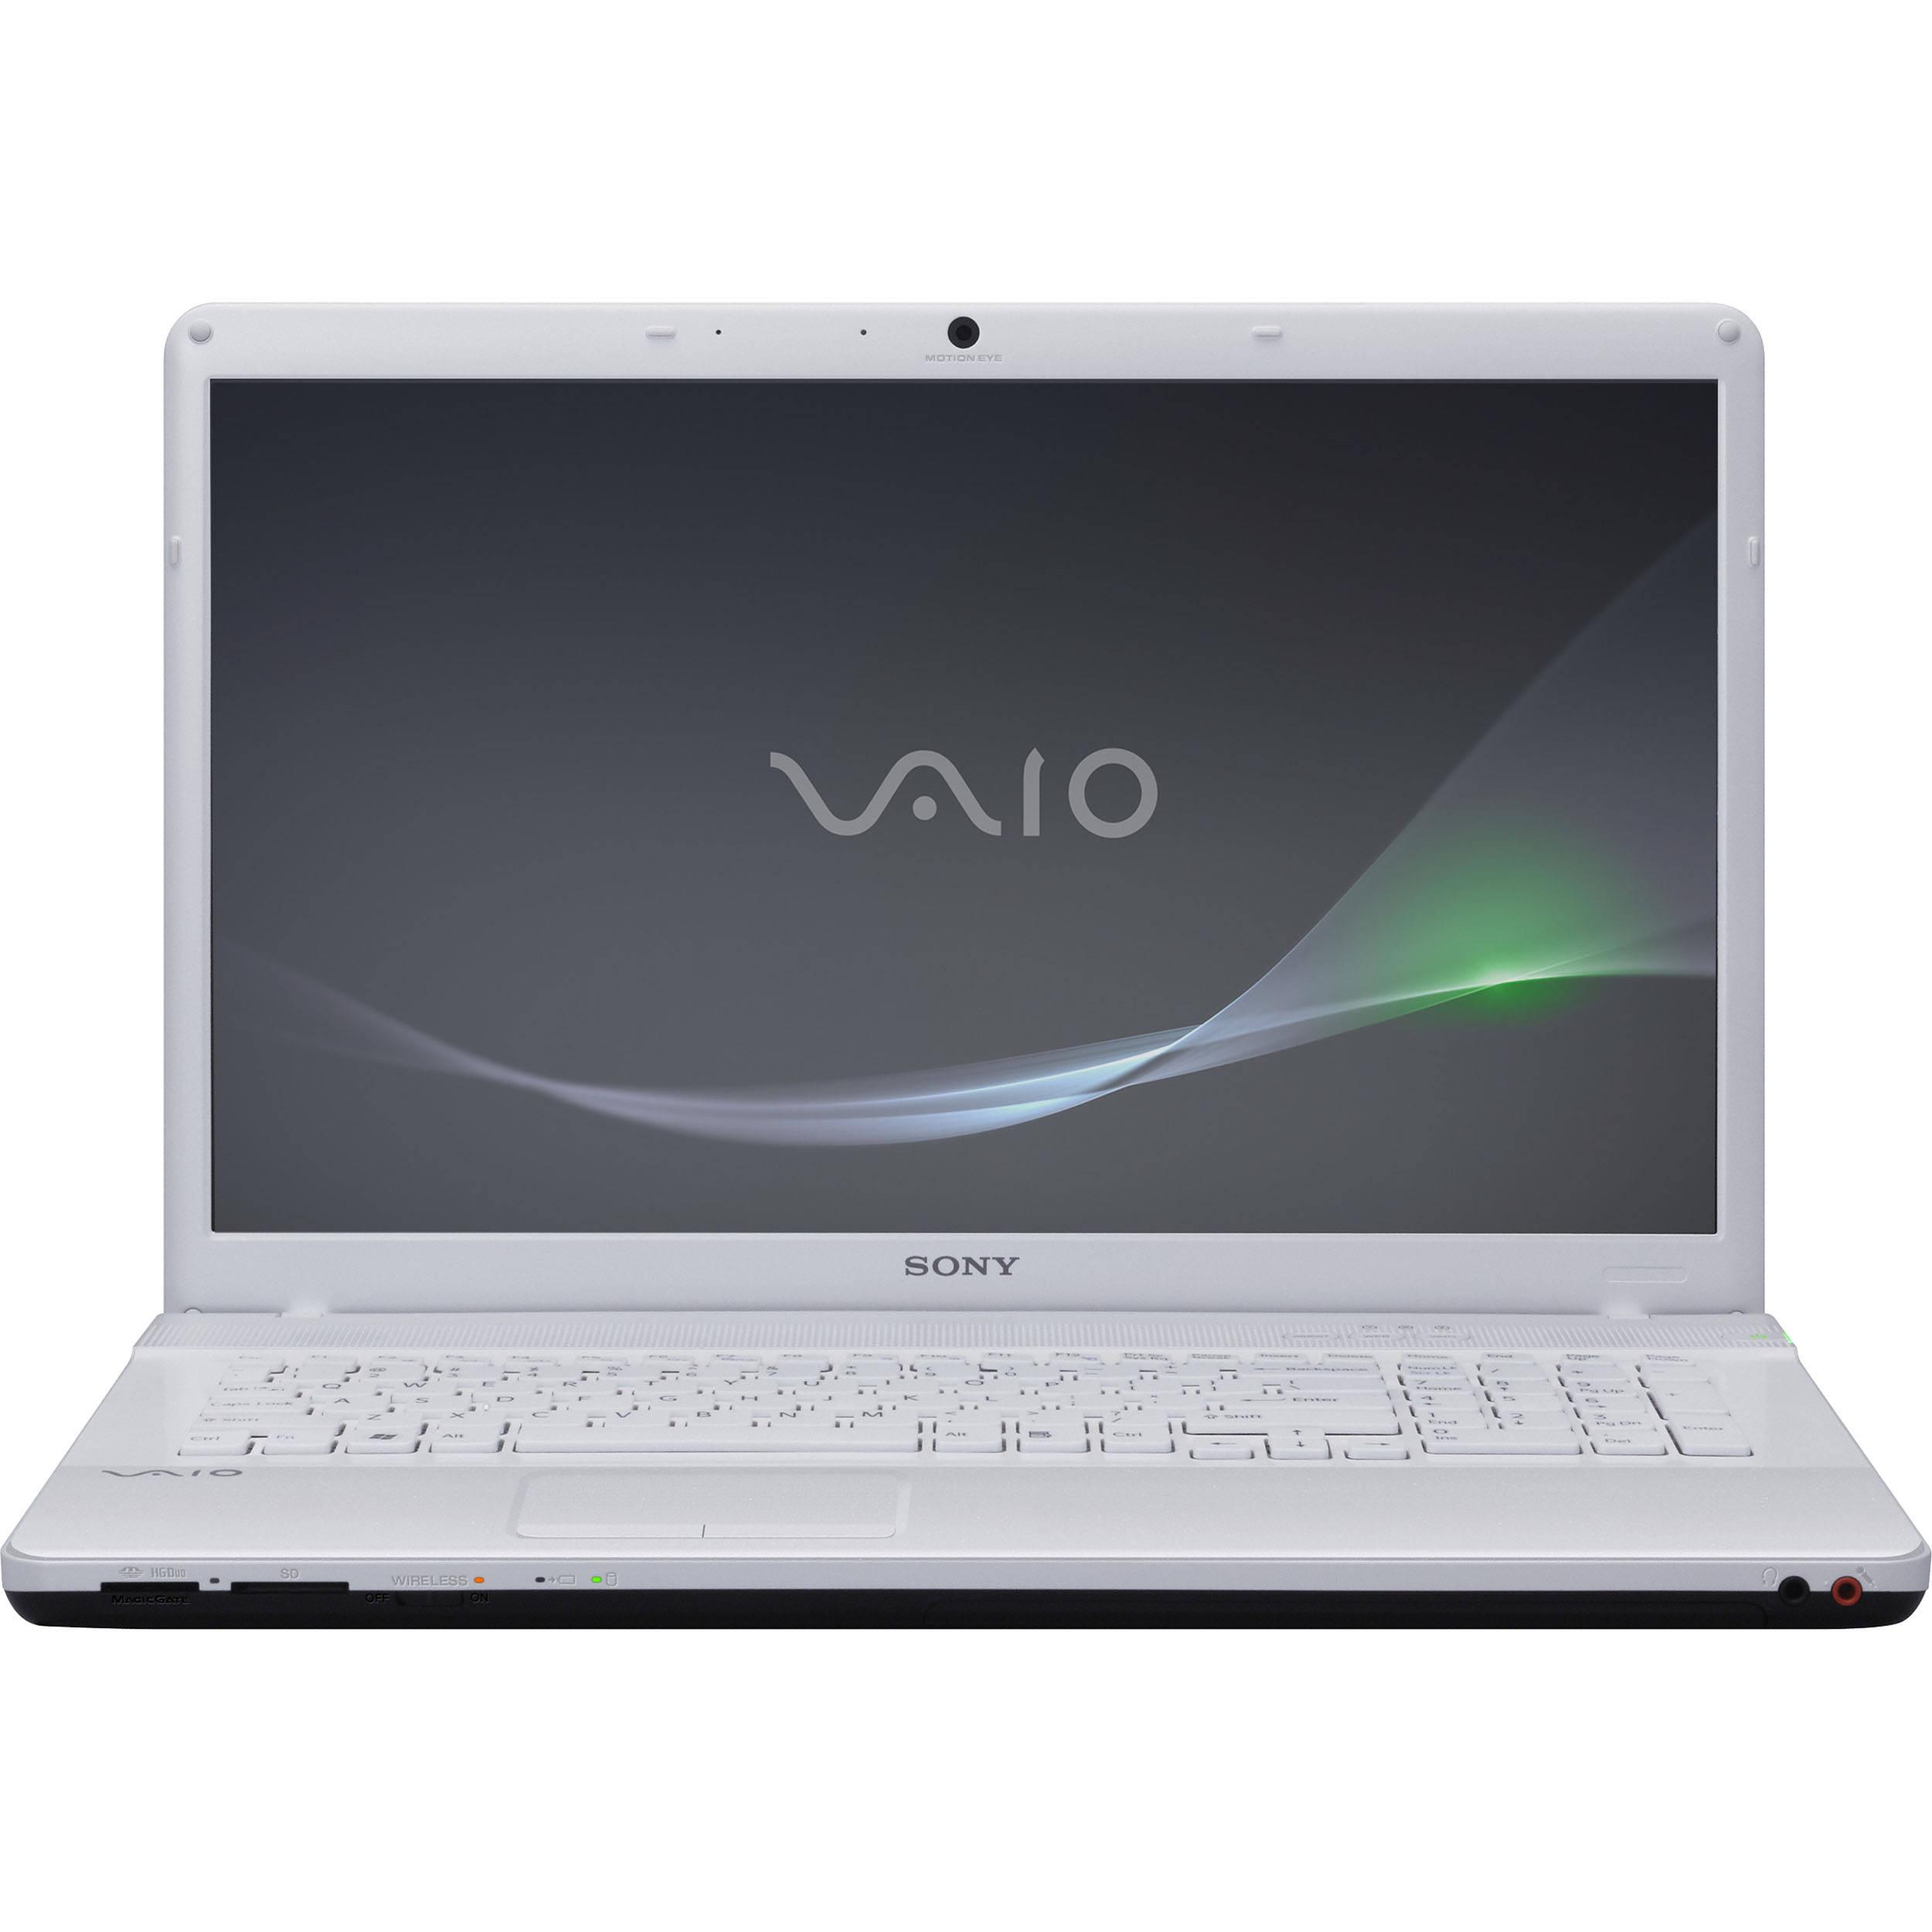 Sony Vaio VPCEC22FX/WI ATI Mobility Radeon HD Graphics Treiber